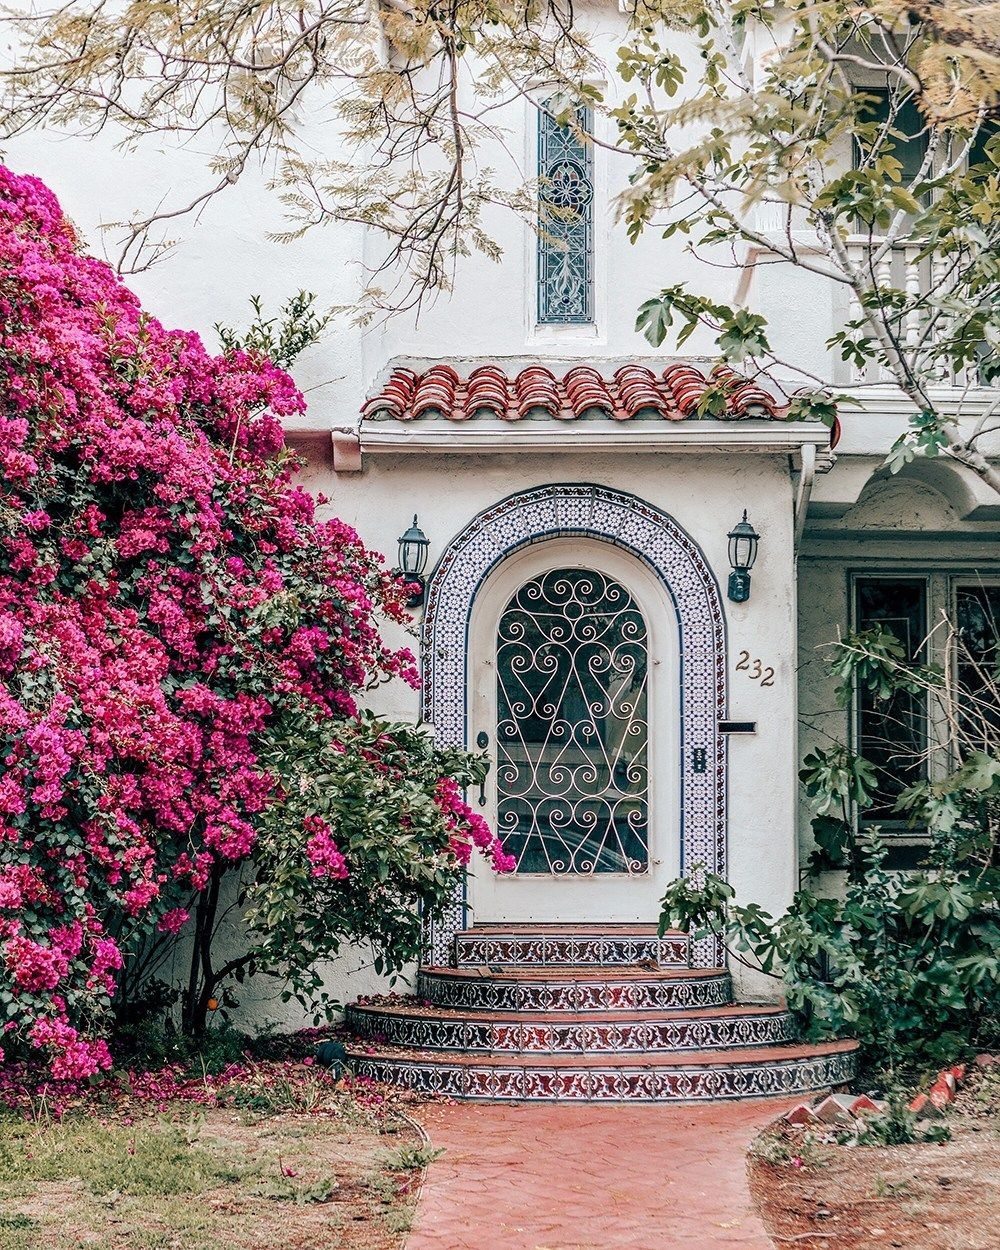 Bougainvillea Love In Los Angeles